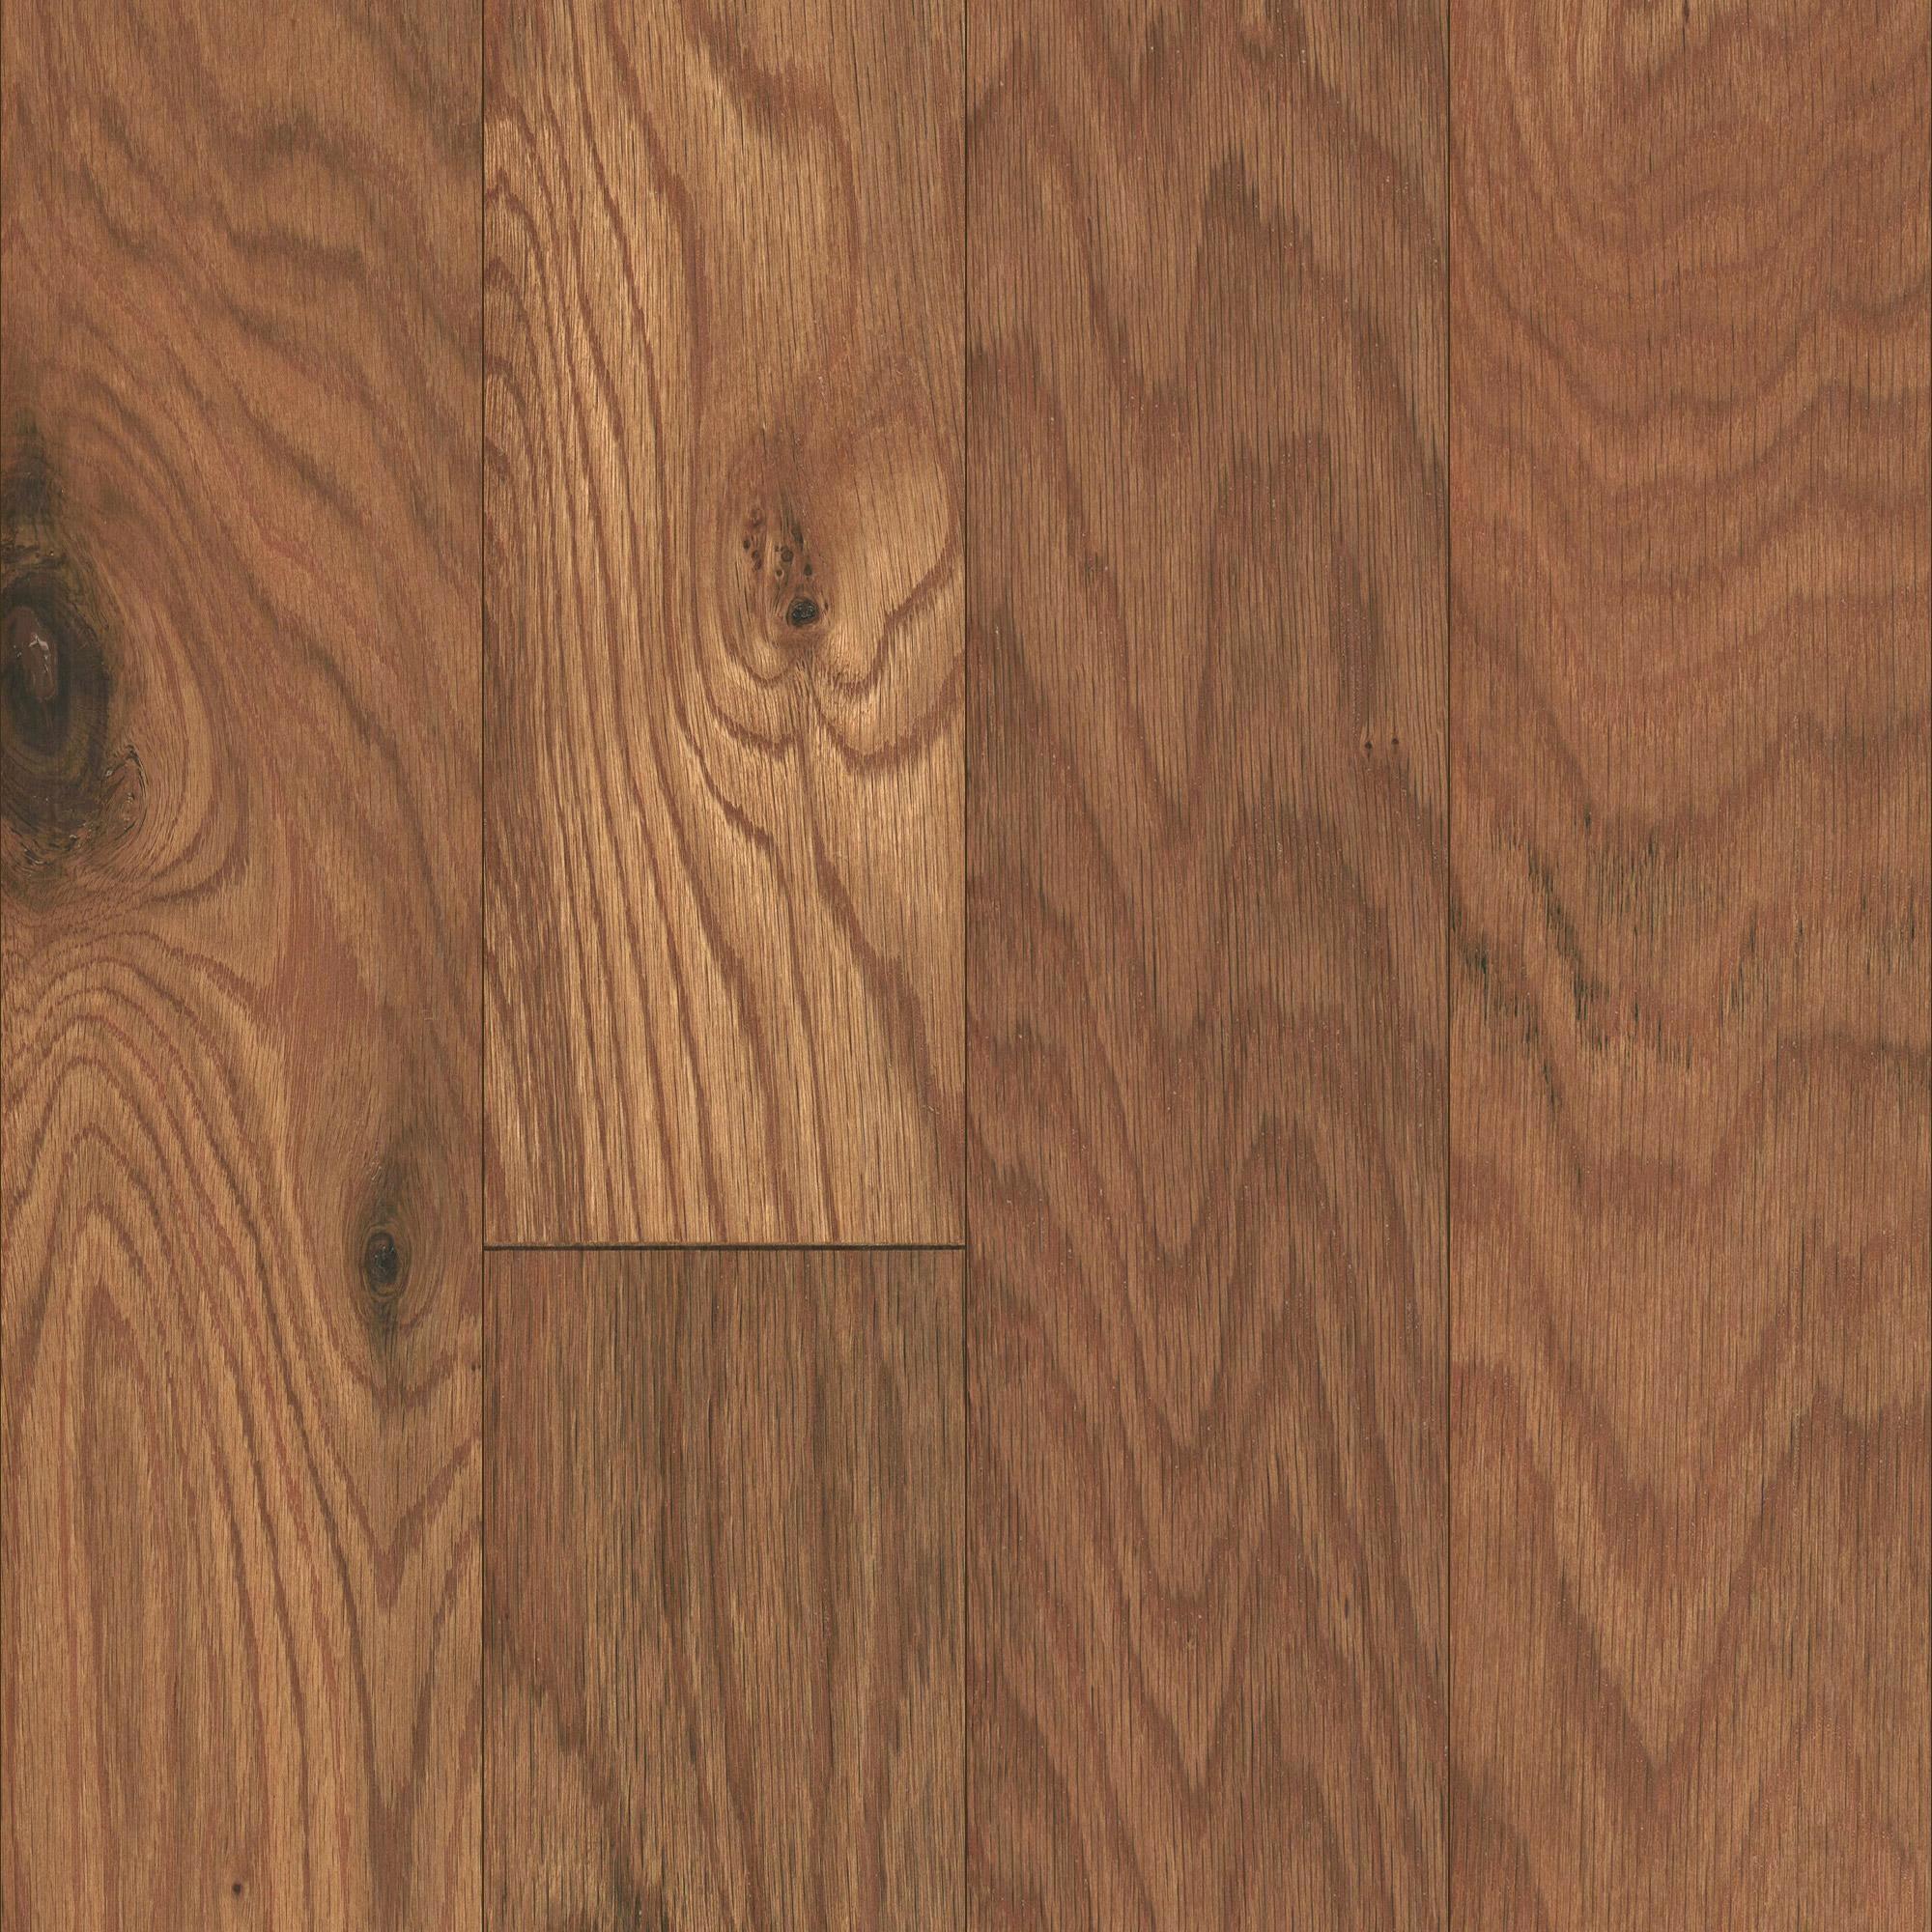 glue down hardwood flooring cost of 16 fresh hardwood floor polish photos dizpos com regarding 50 fresh engineered hardwood flooring cost 50 s